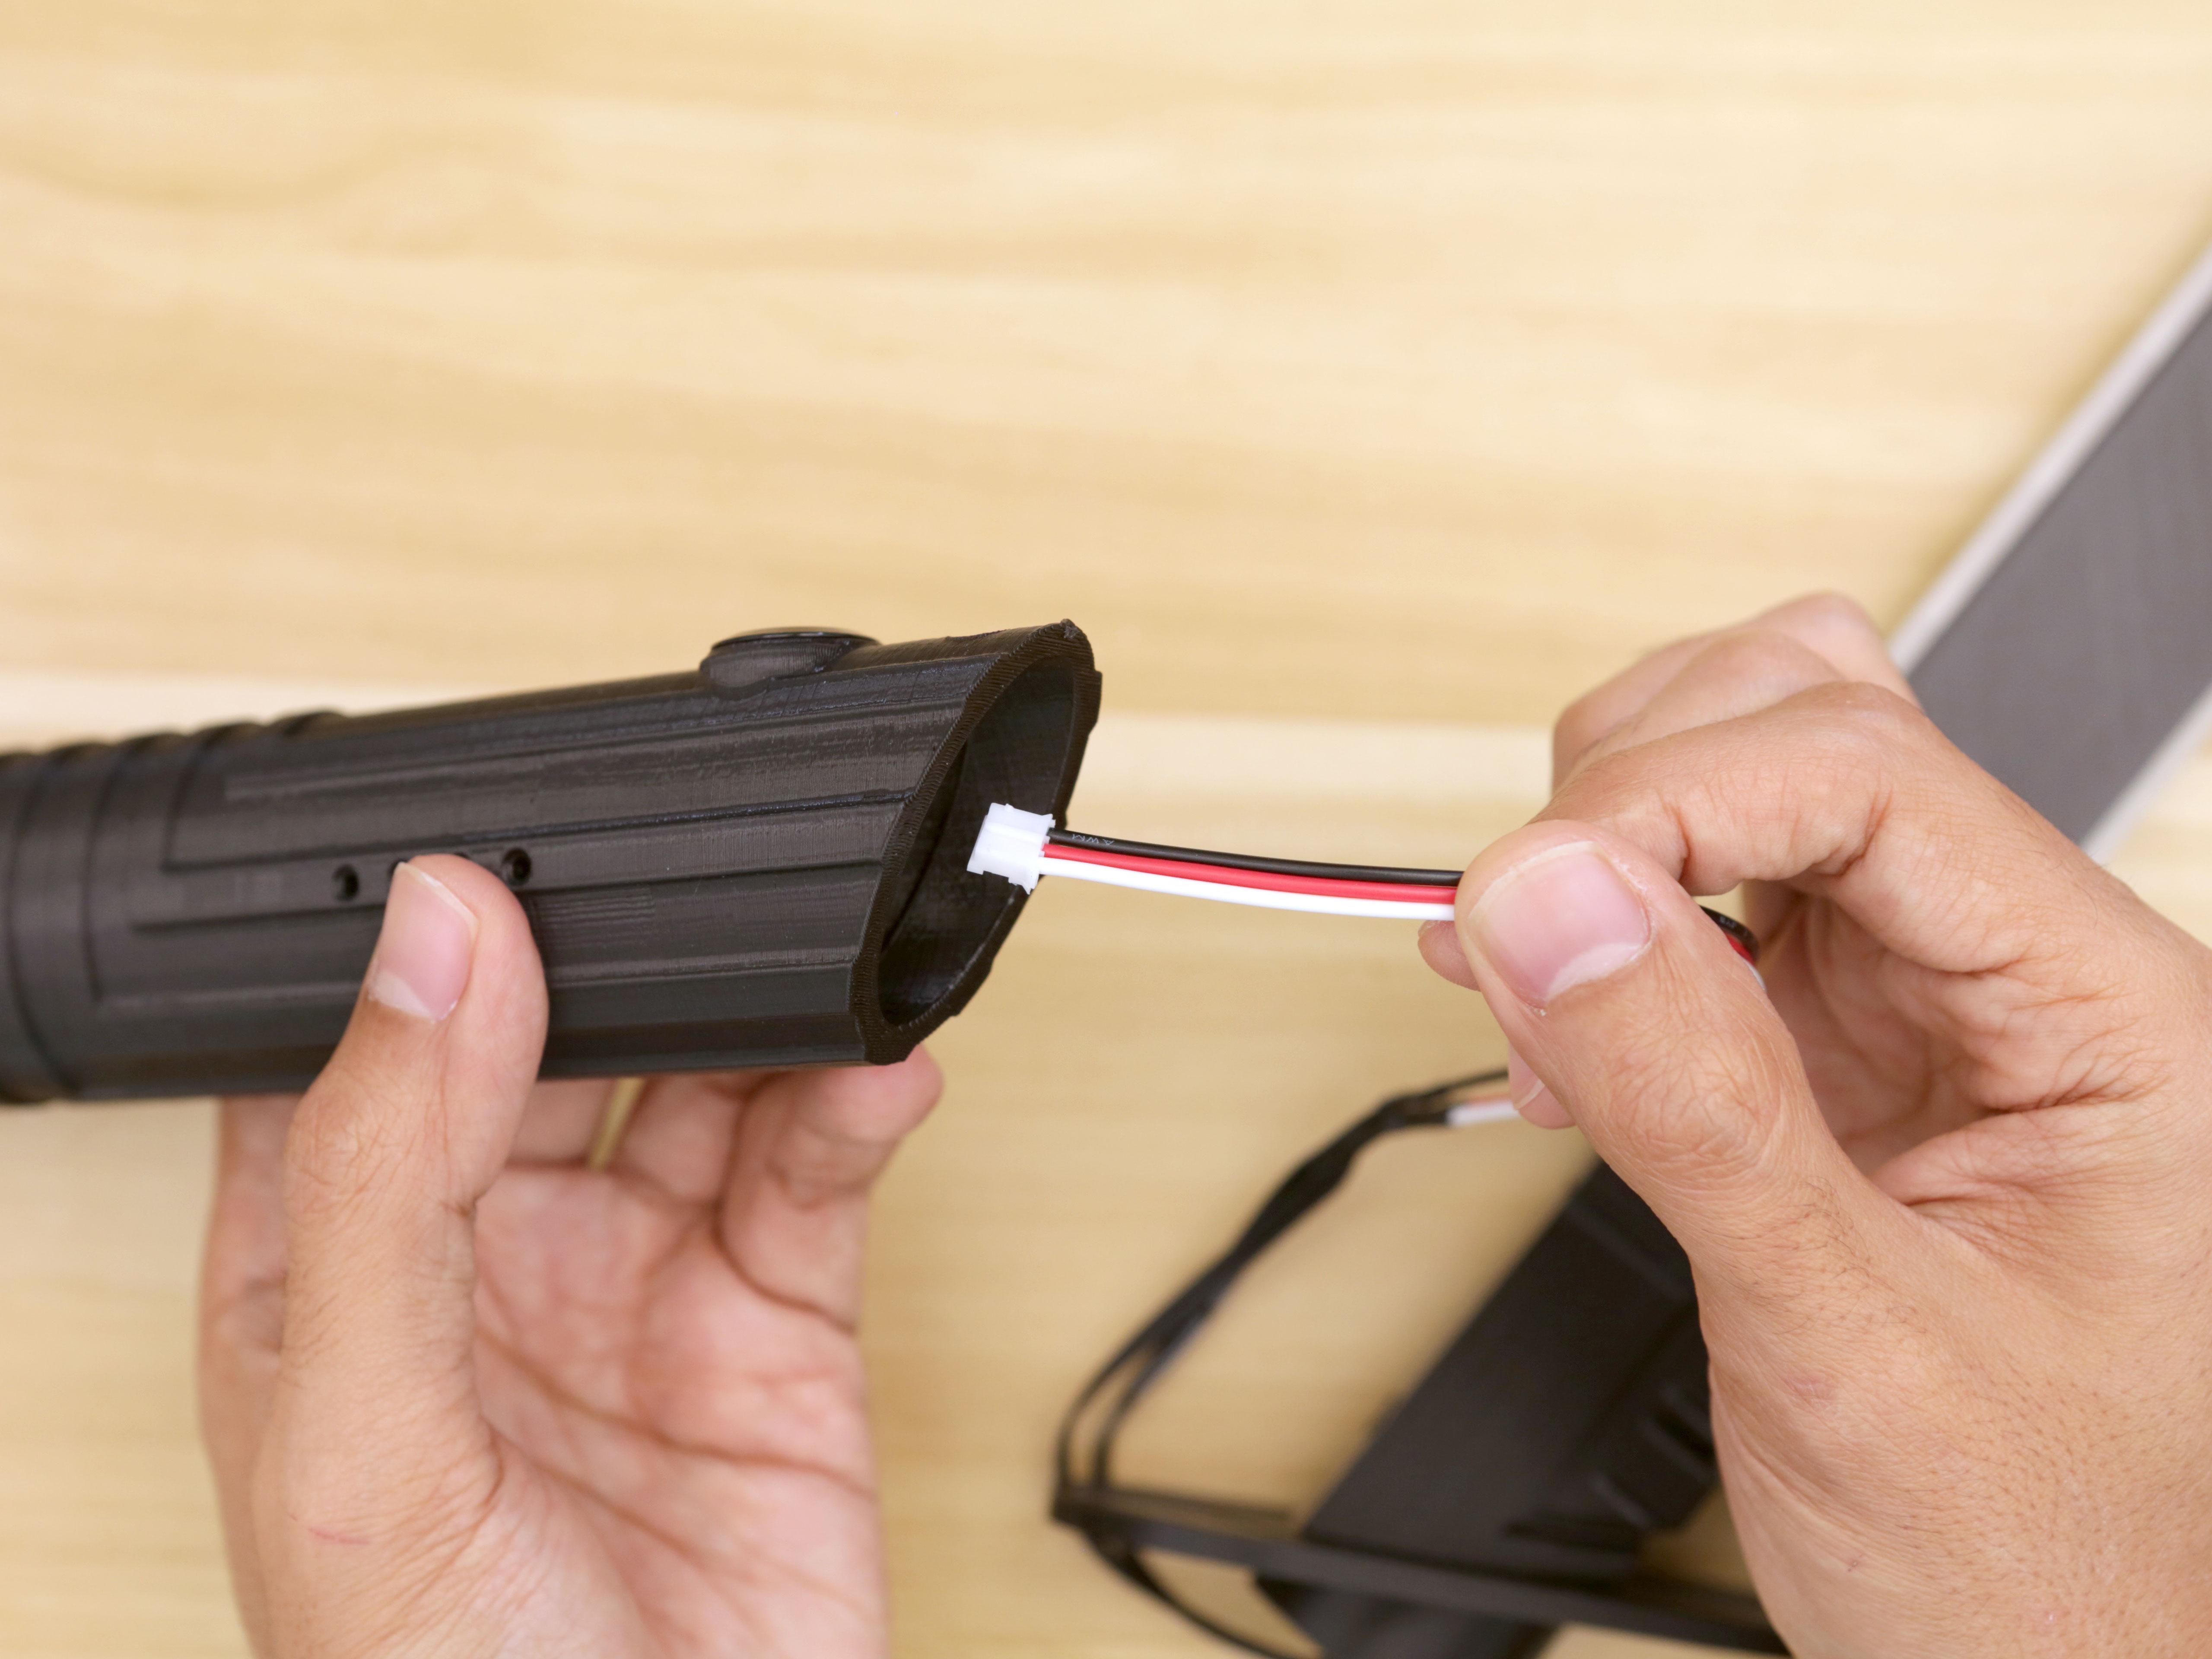 3d_printing_blade-cable-hilt-install.jpg